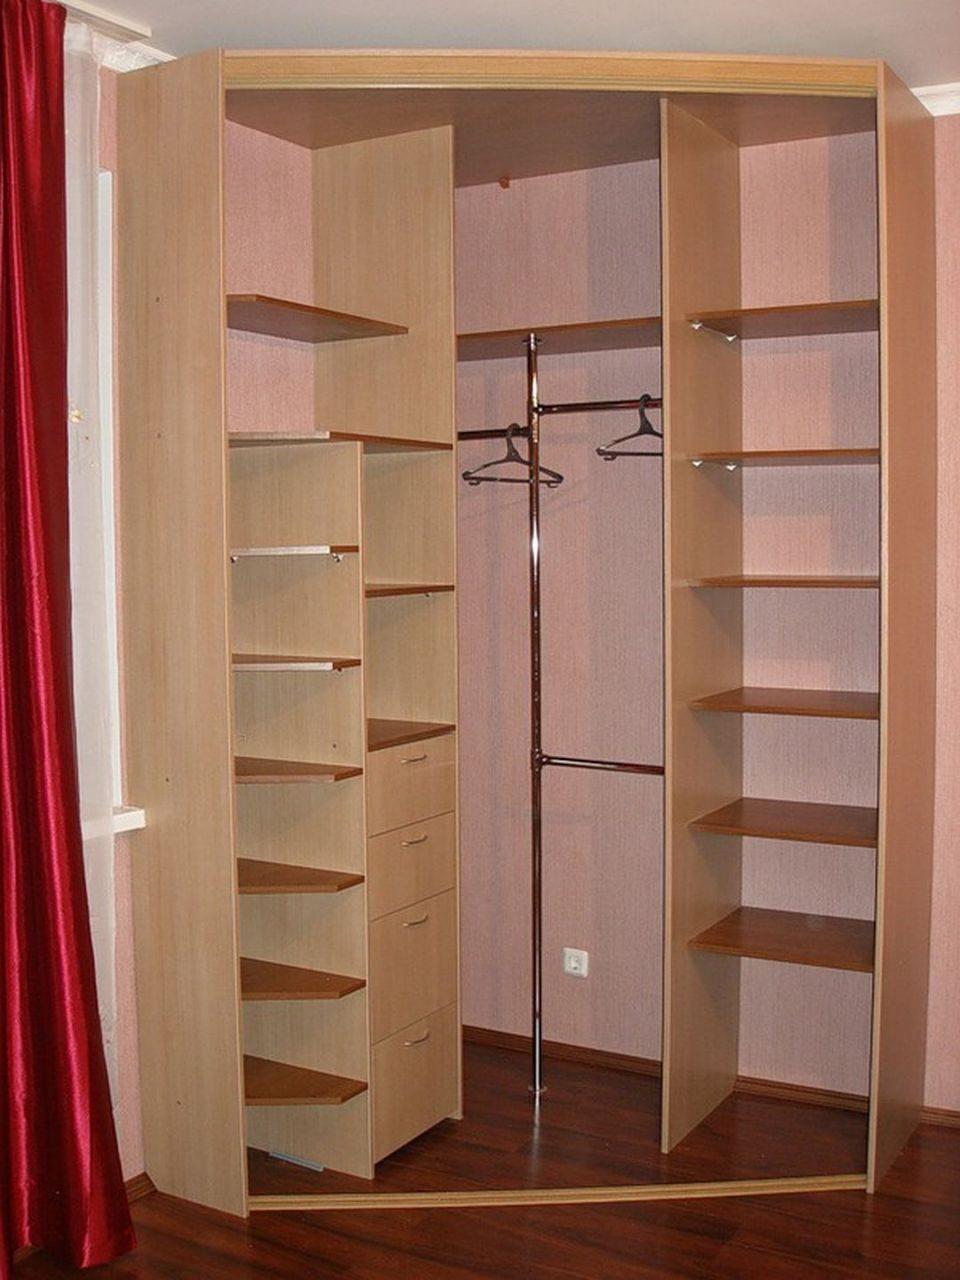 Шкафы купе фото. каталог фотографий шкафов-купе.